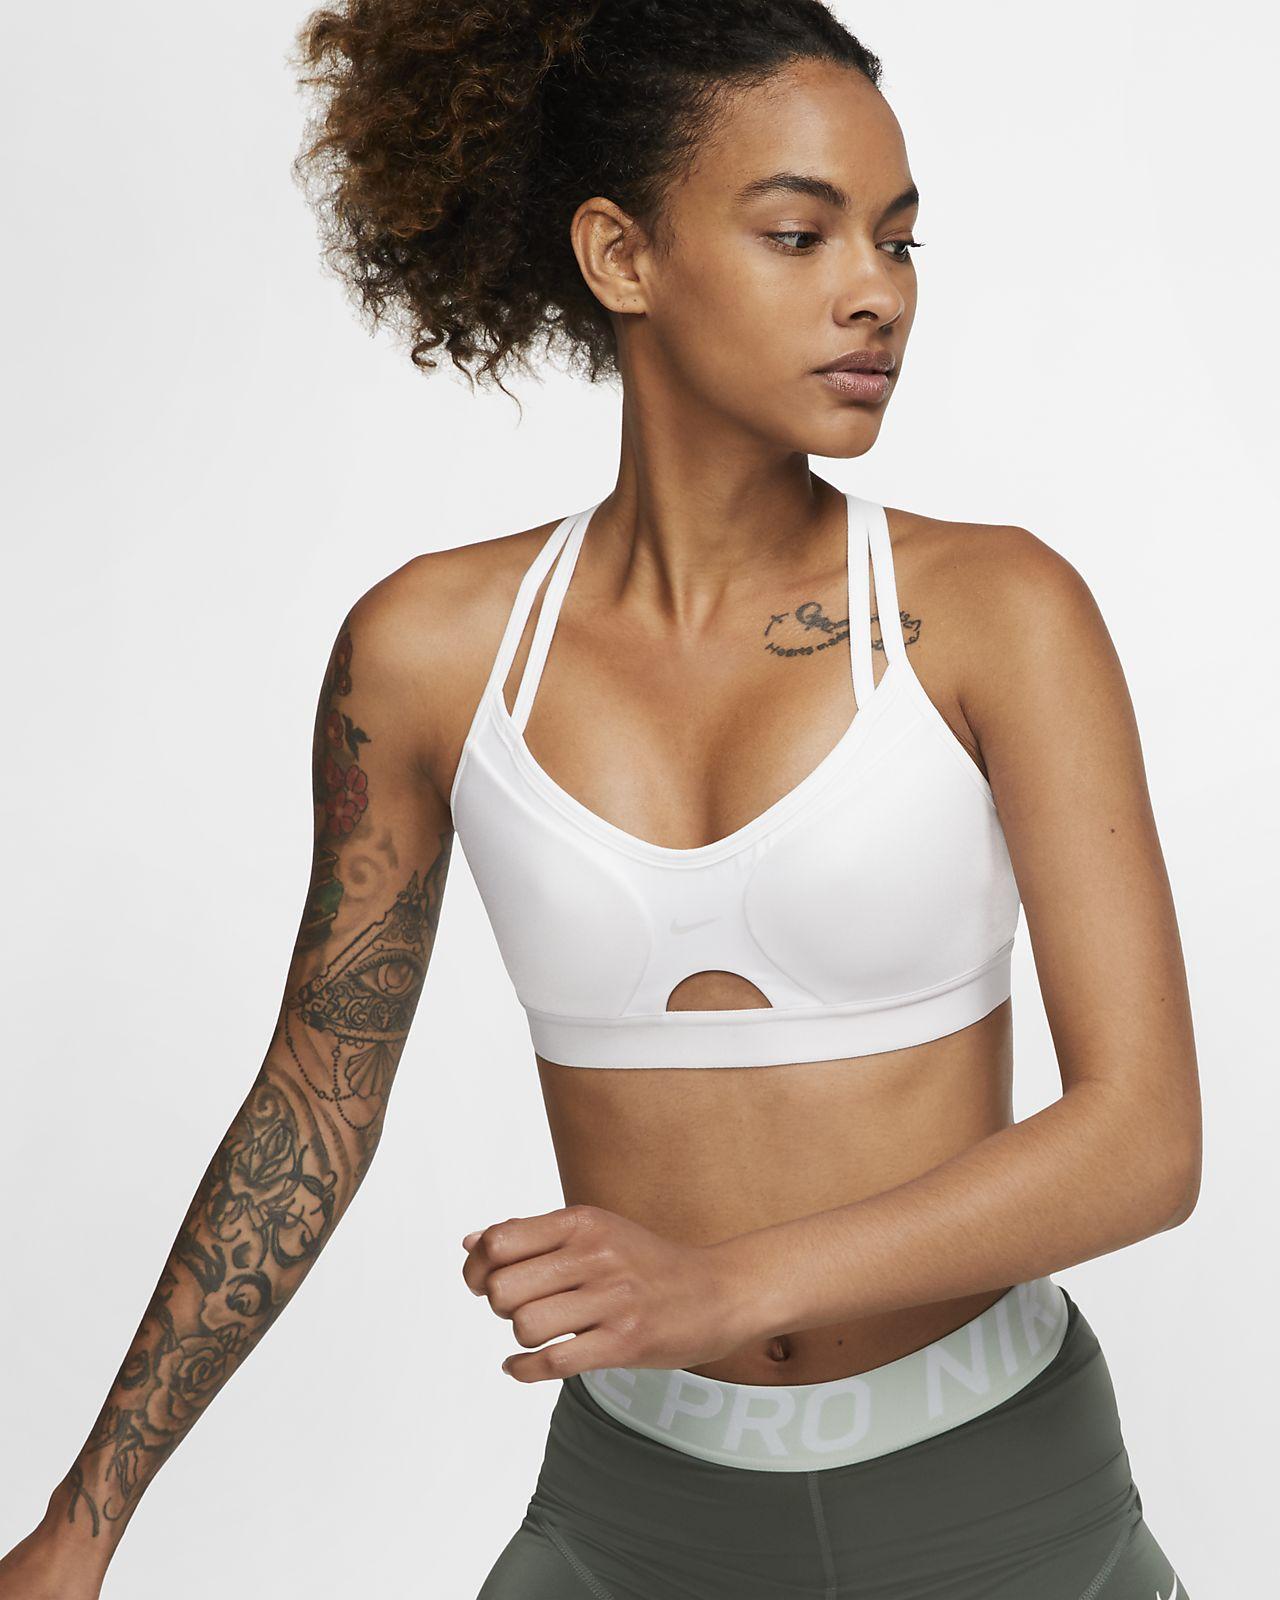 Nike Motion Adapt Indy Women's Medium-Support Sports Bra